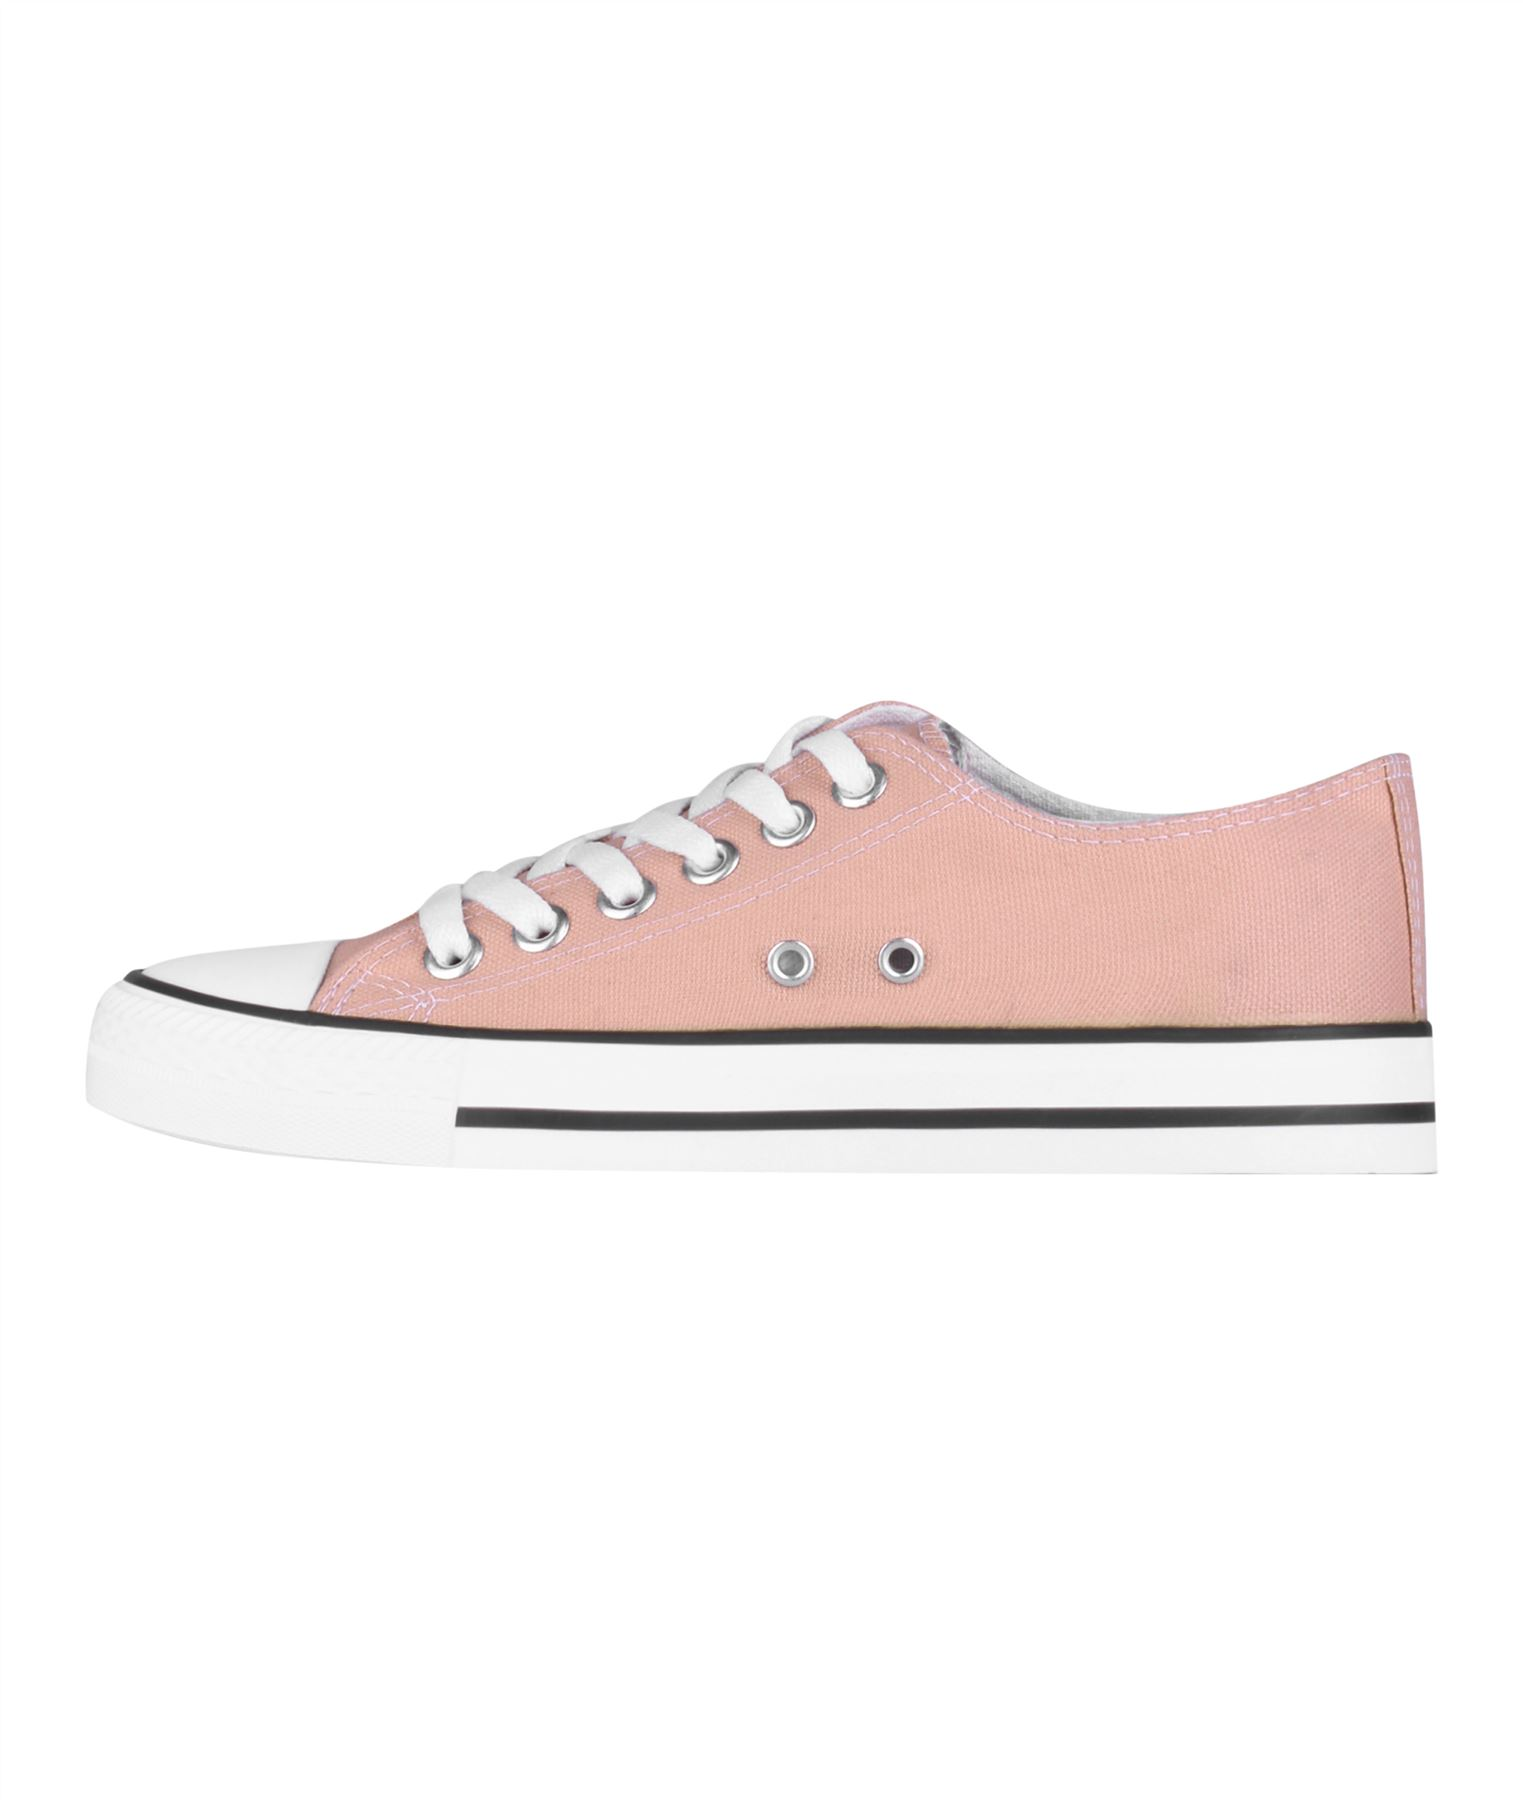 Zapatillas-Mujer-Casuales-Deportiva-Barata-Lona-Moda-Originales-Outlet-Tela-Moda miniatura 45